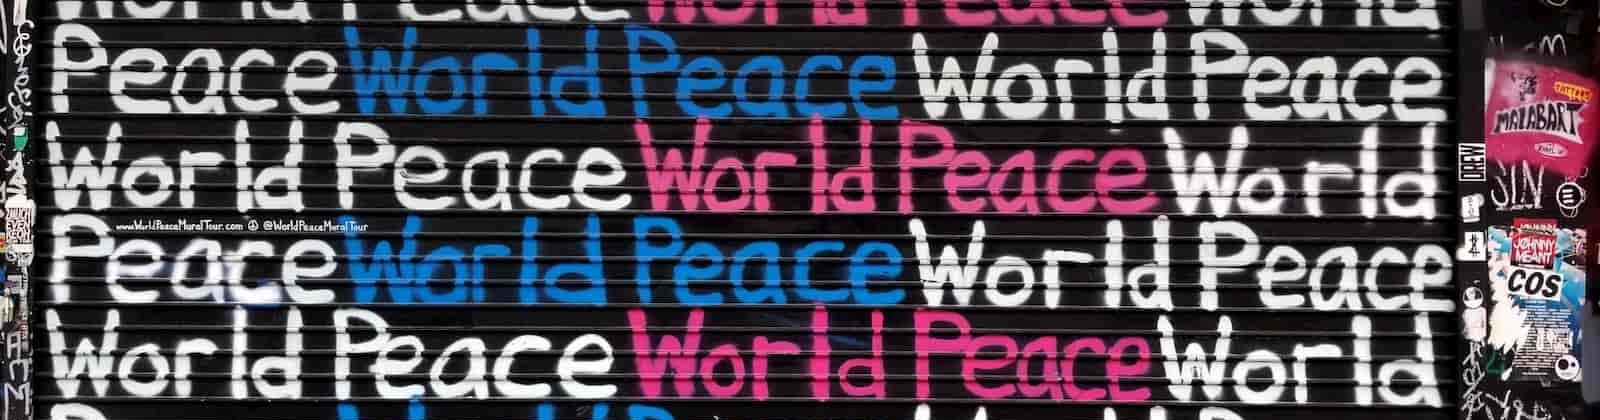 world peace graffiti